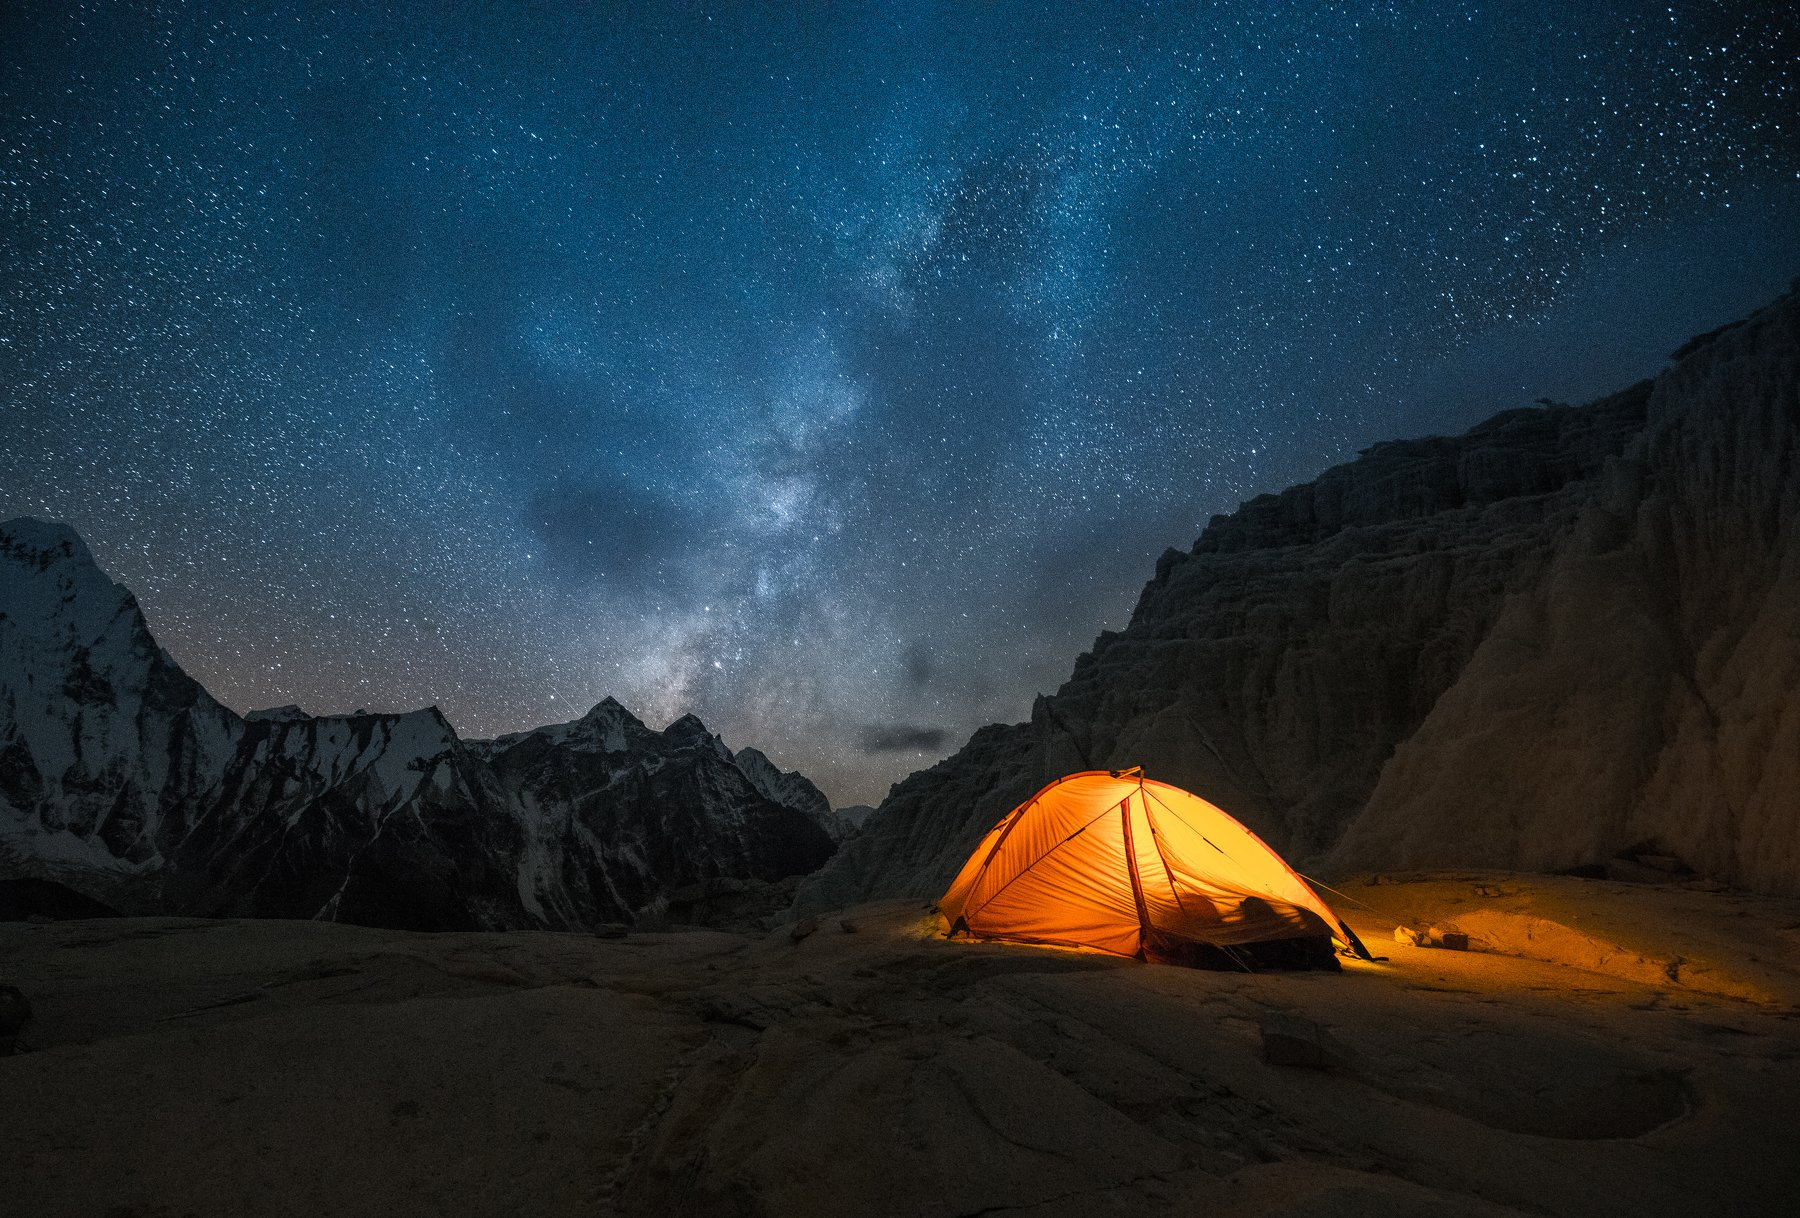 Гималаи, Мингбо-ла, Непал, палатка, горы, Evgeniy Khilkevitch